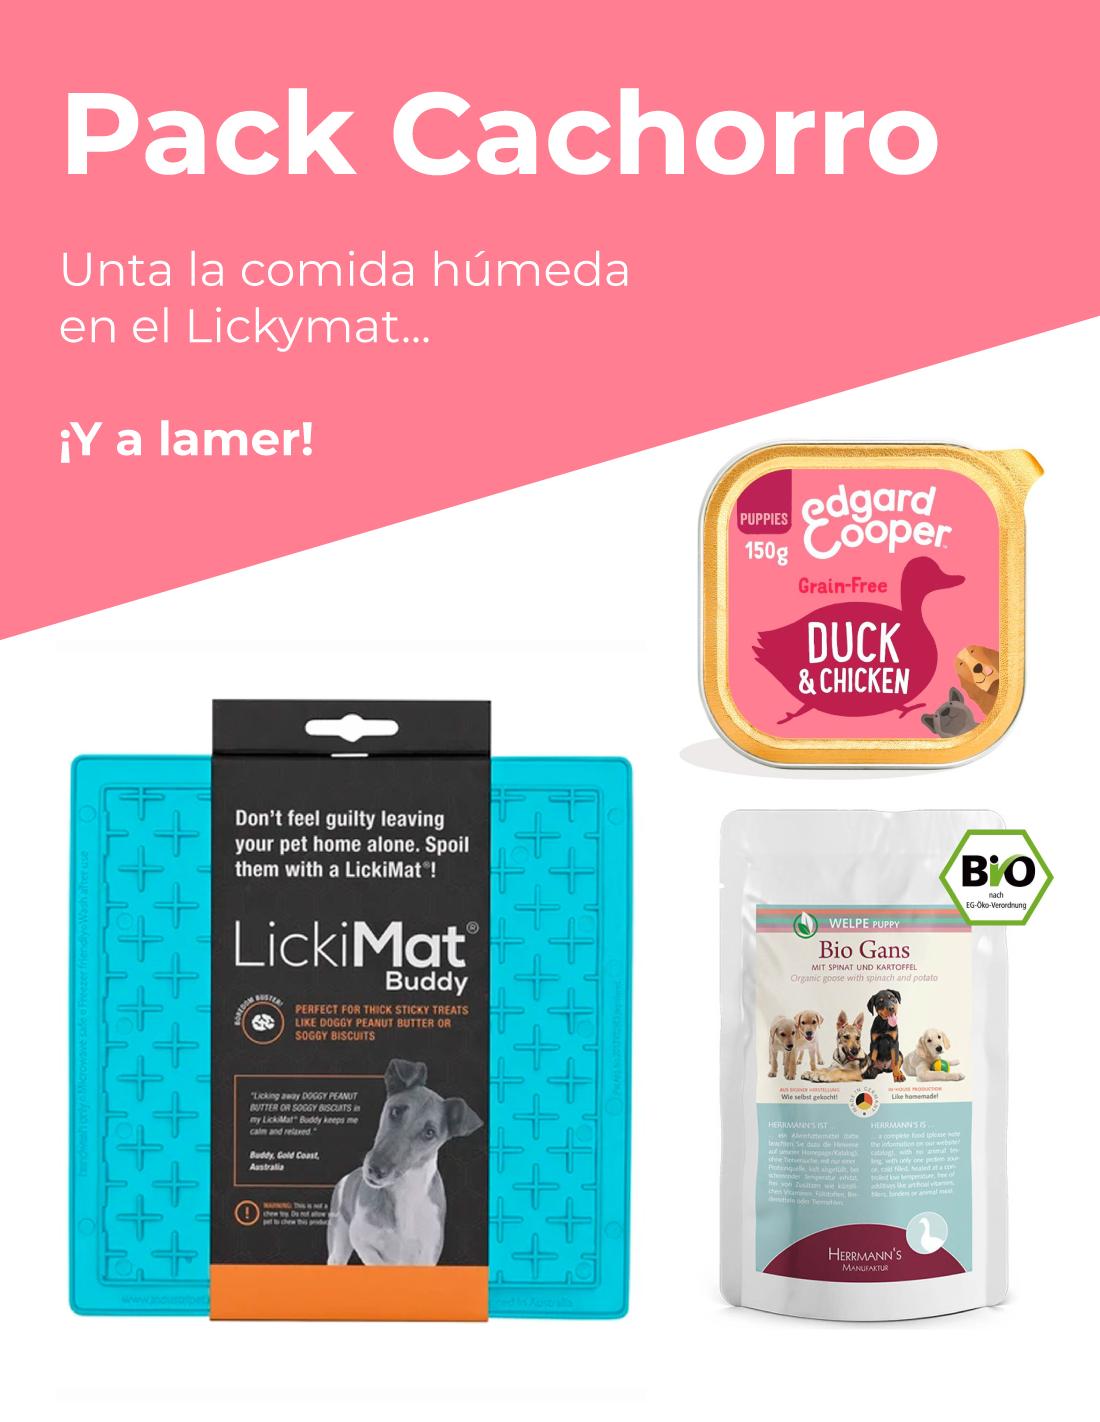 Pack Cachorro: LickiMat + Comida Húmeda para Lamer